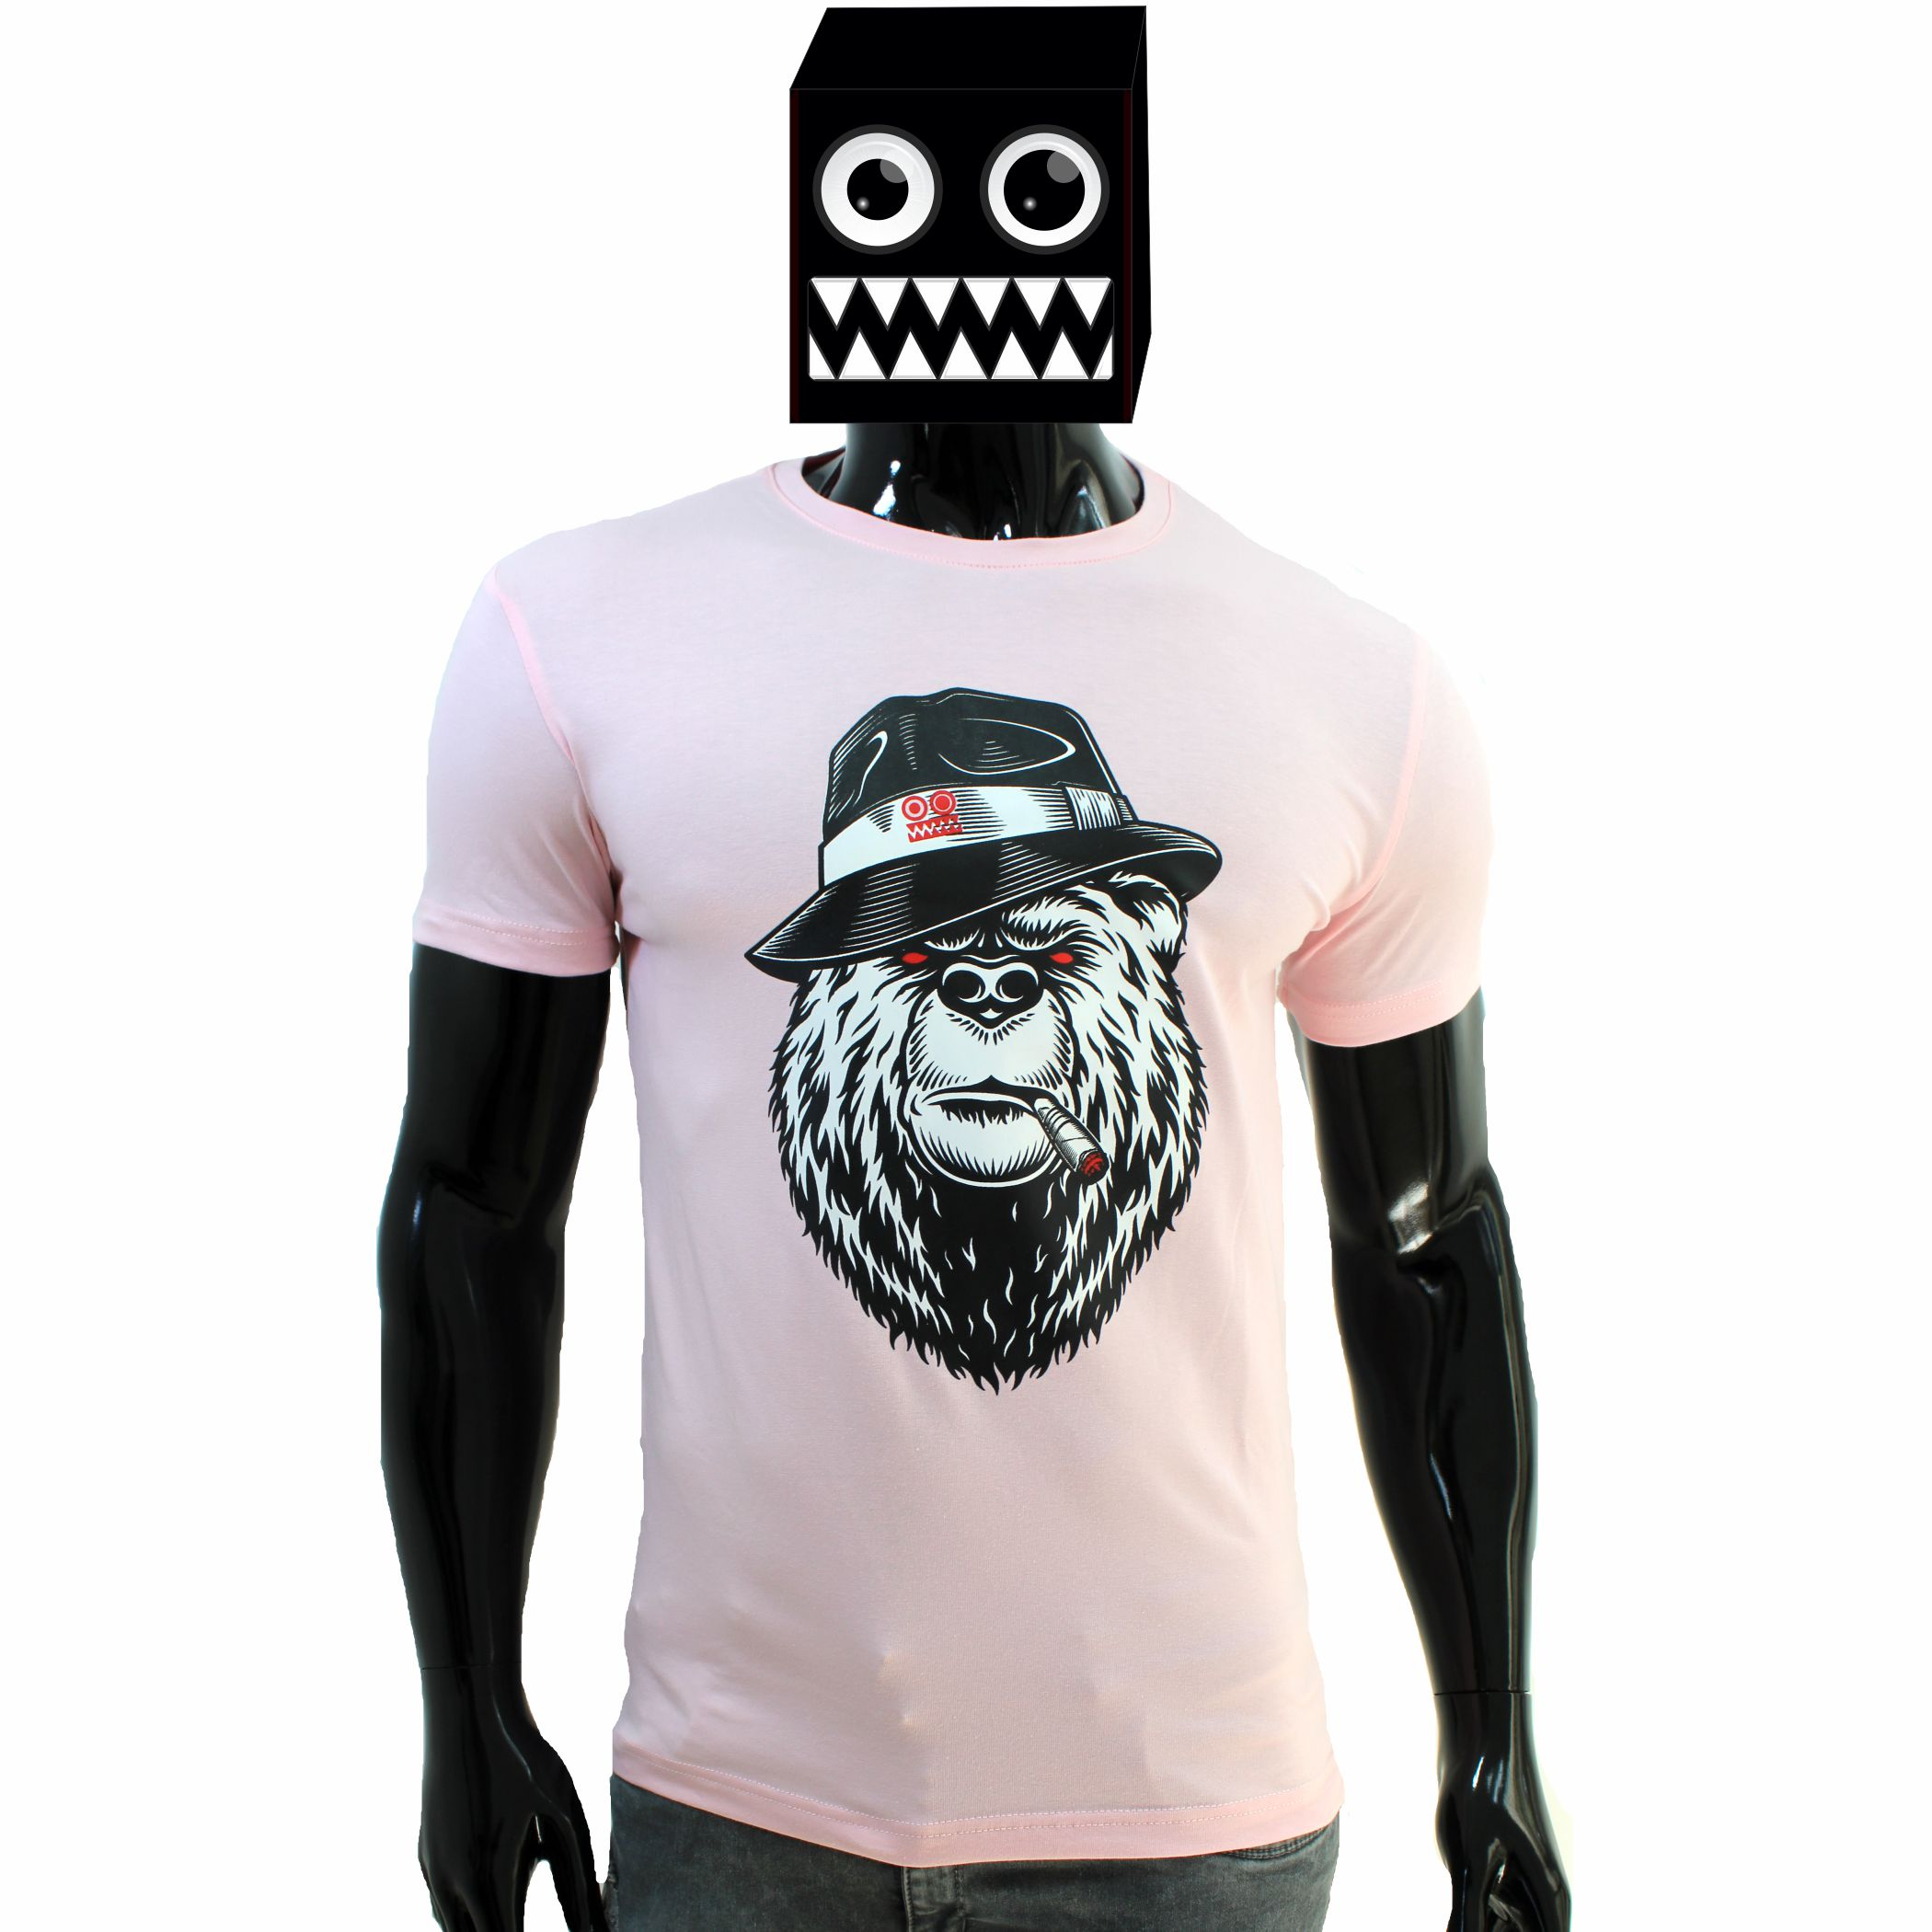 ref 1635  camiseta rosado osos fumando, tela en algodón expande